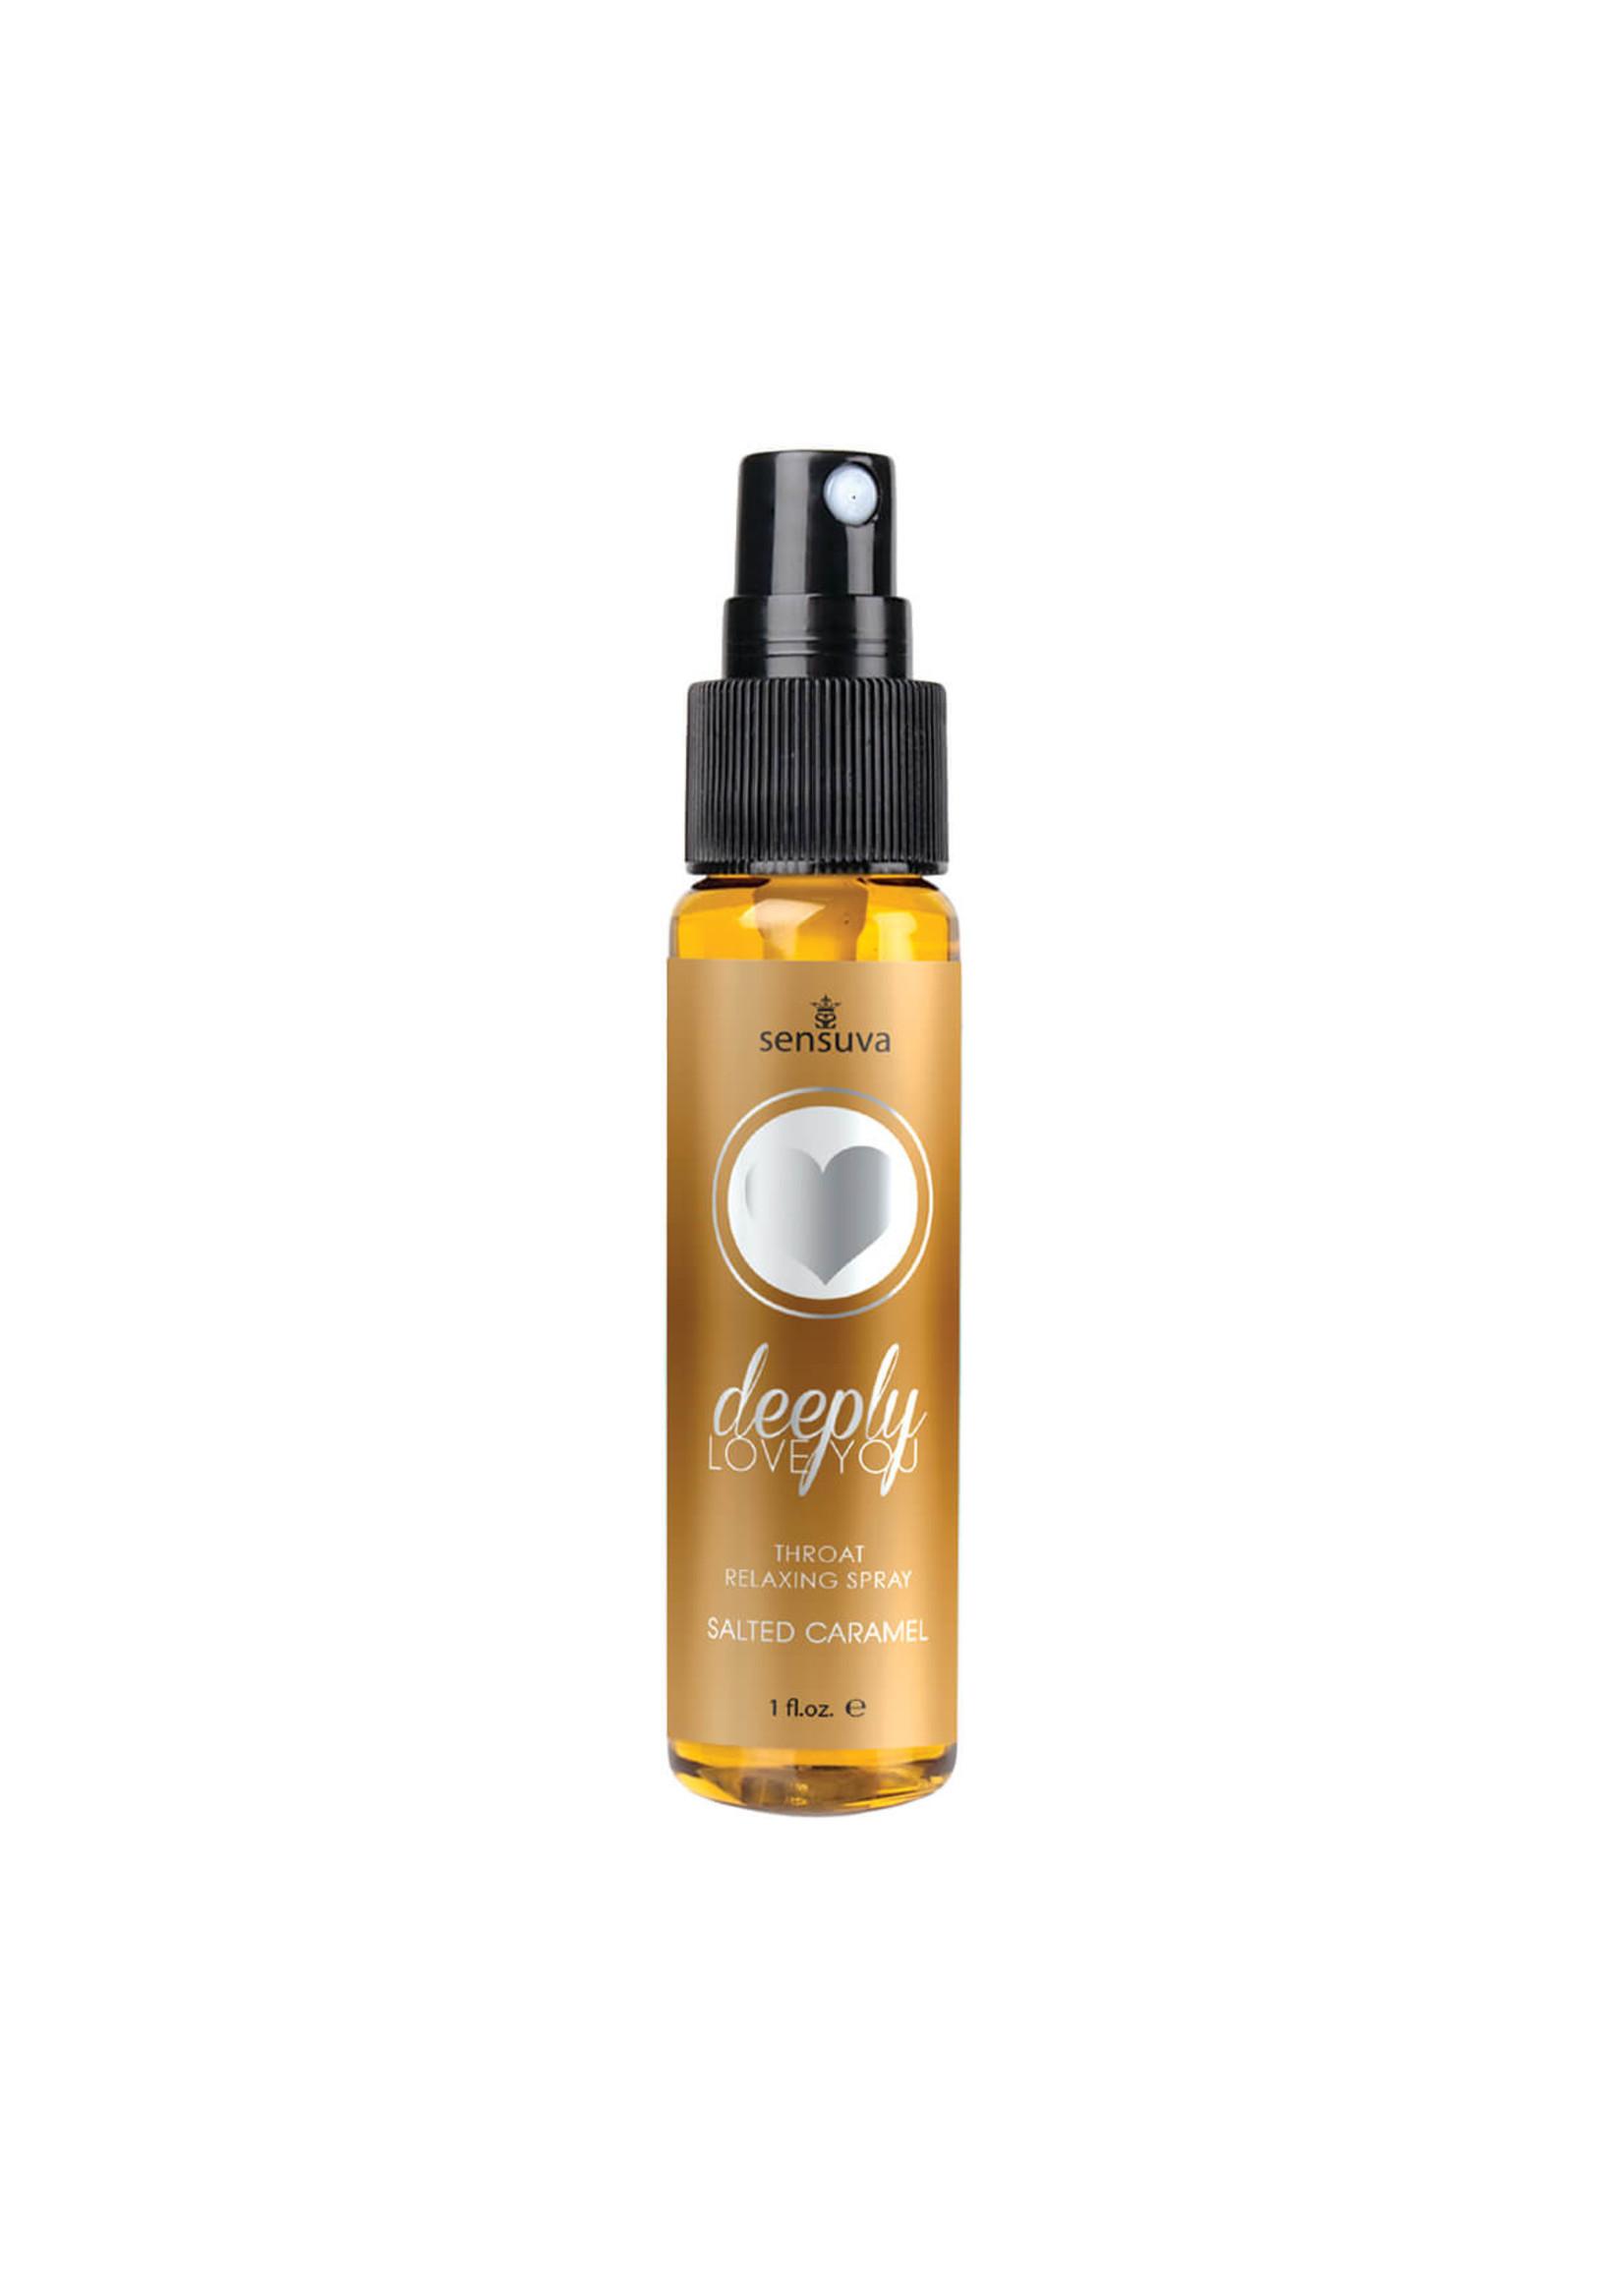 Sensuva Deeply Love You Salted Caramel Throat Relaxing Spray 1 oz.